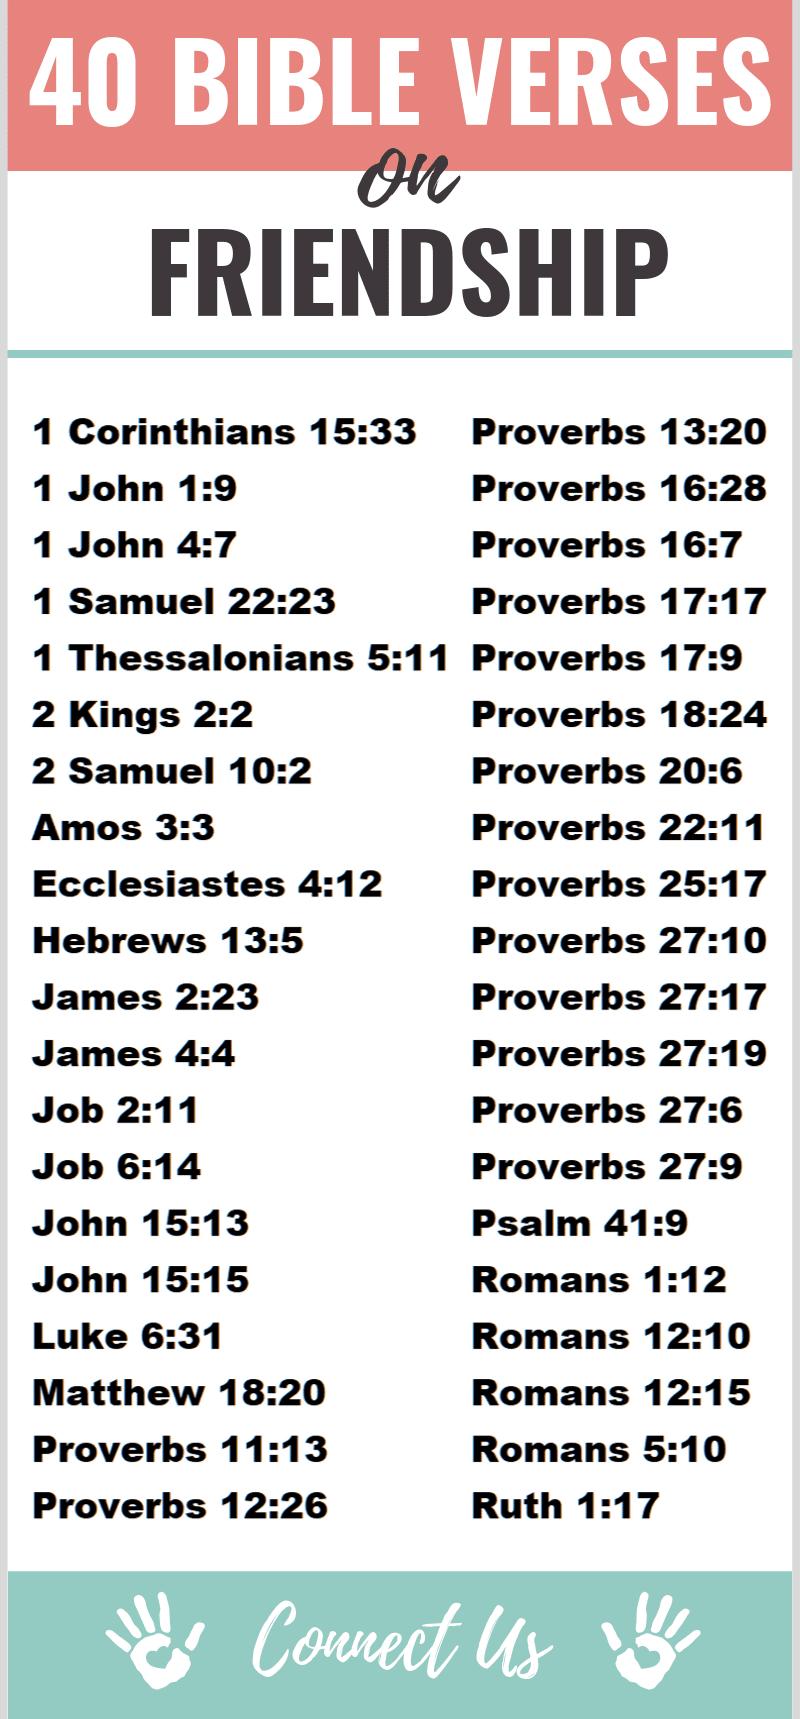 Bible-Verses-on-Friendship